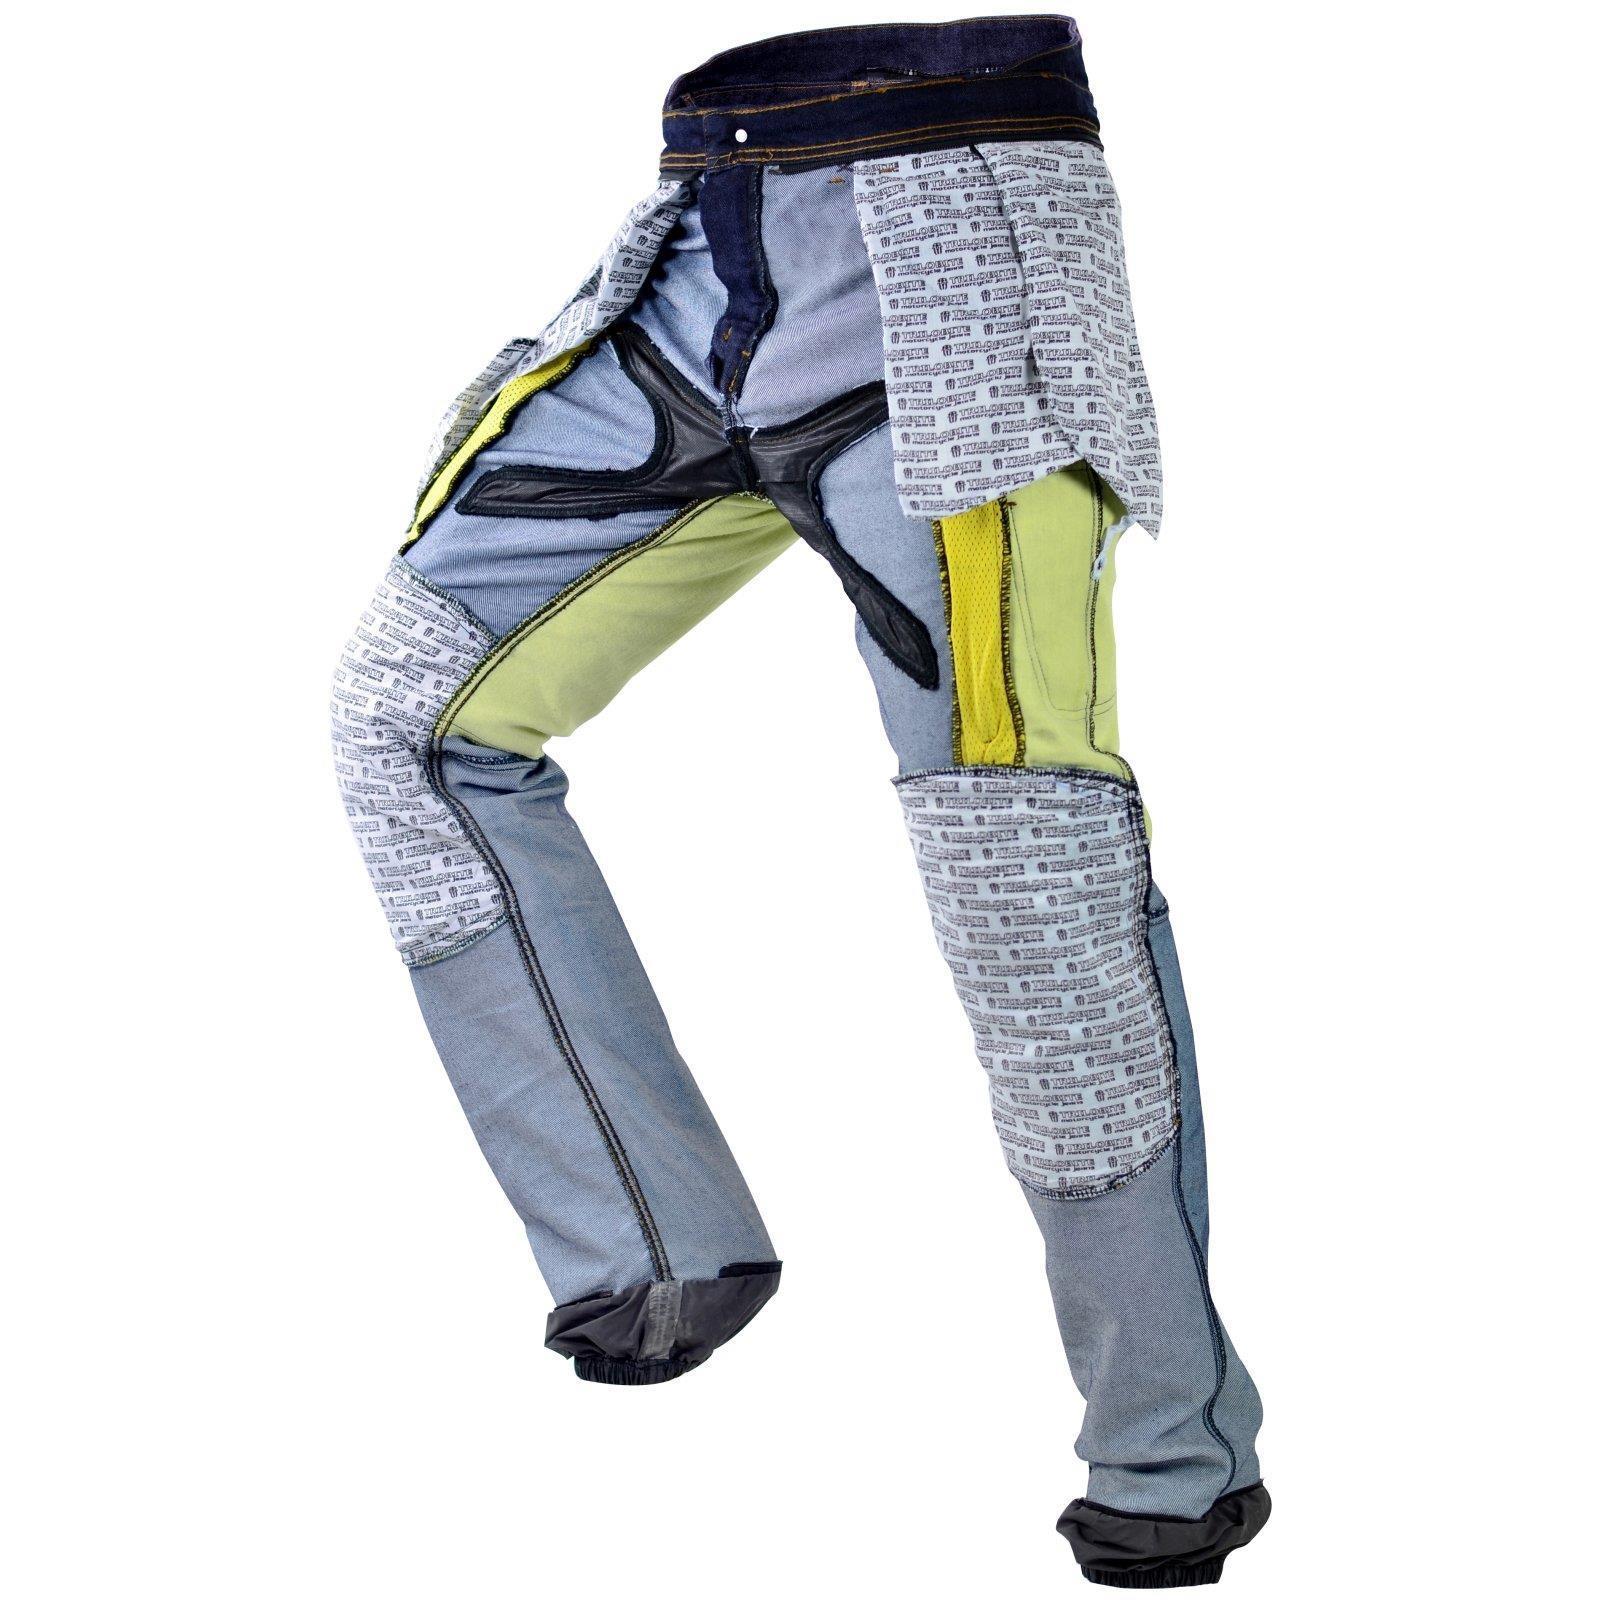 Trilobite-Pantaloni-Moto-Jeans-Abbigliamento-Parado-MICAS-URBAN-DUAL-PANTS-ACID miniatura 89